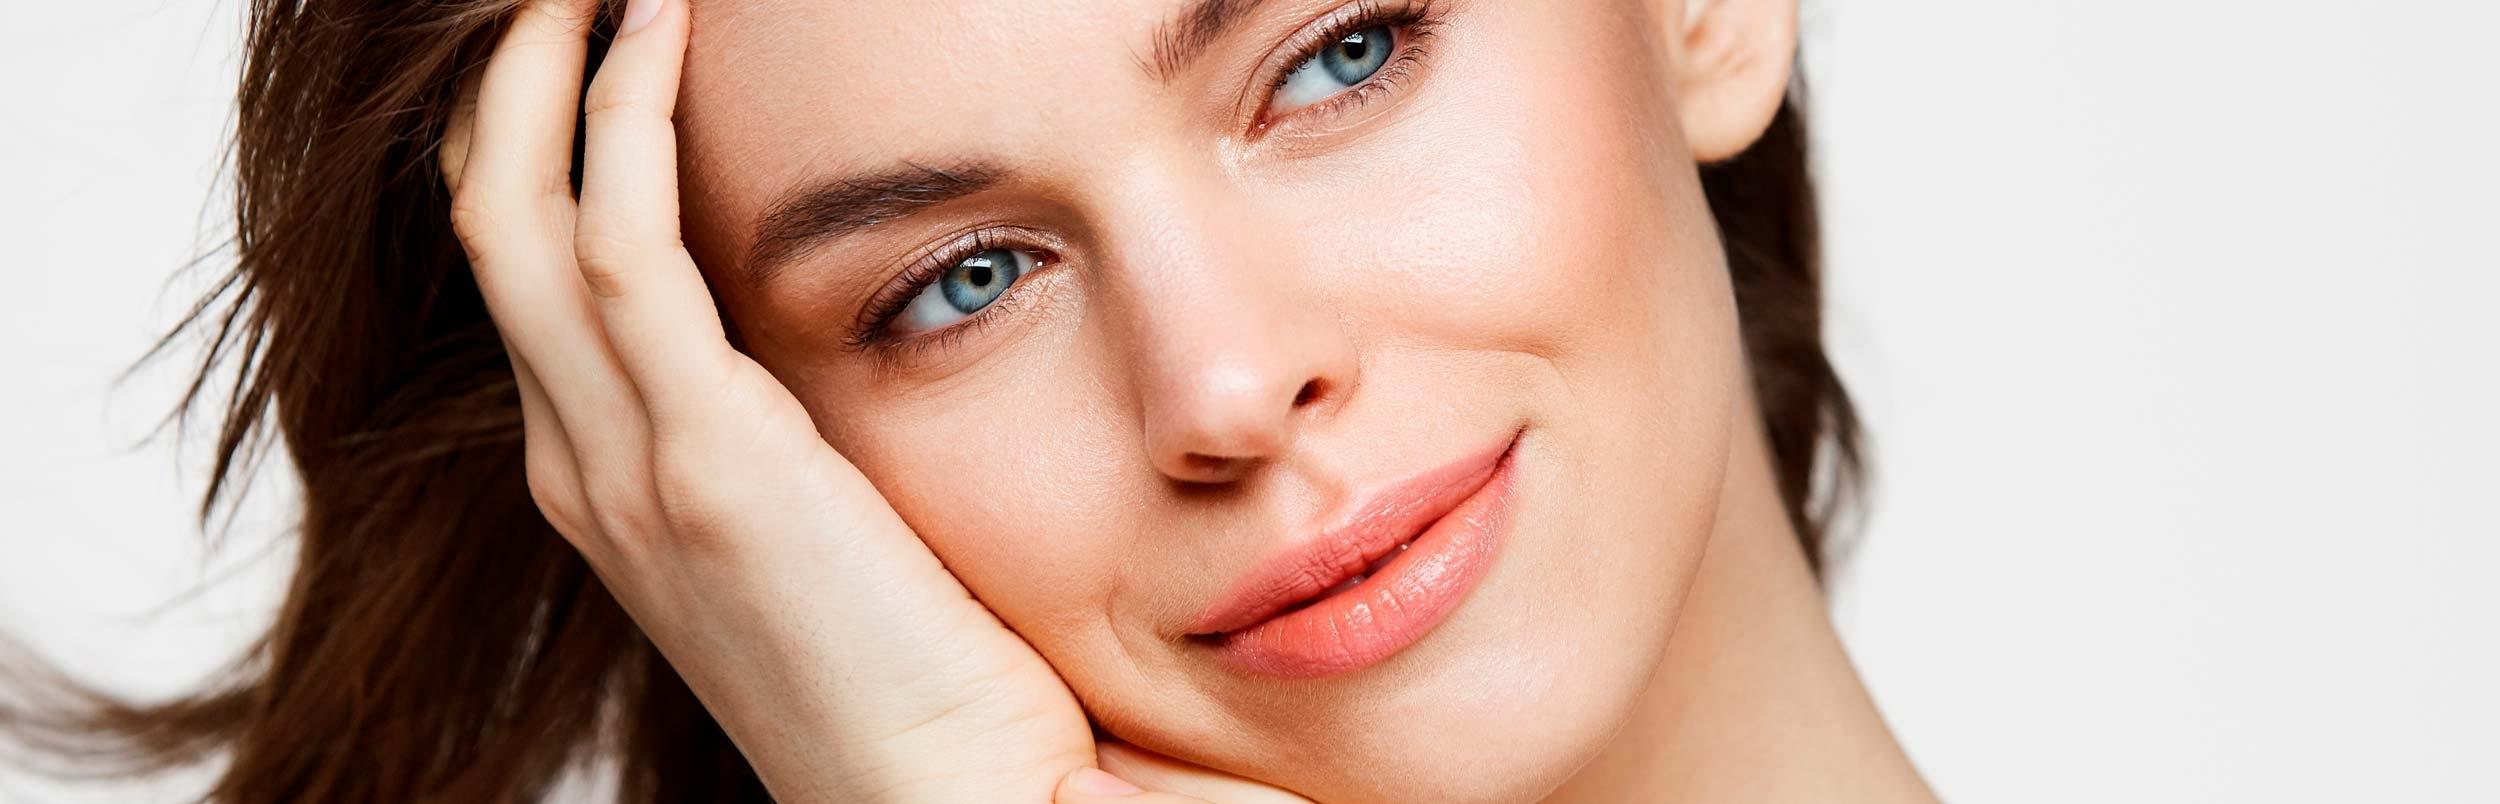 Dull Skin – ZO® Skin Health Exfoliating Products